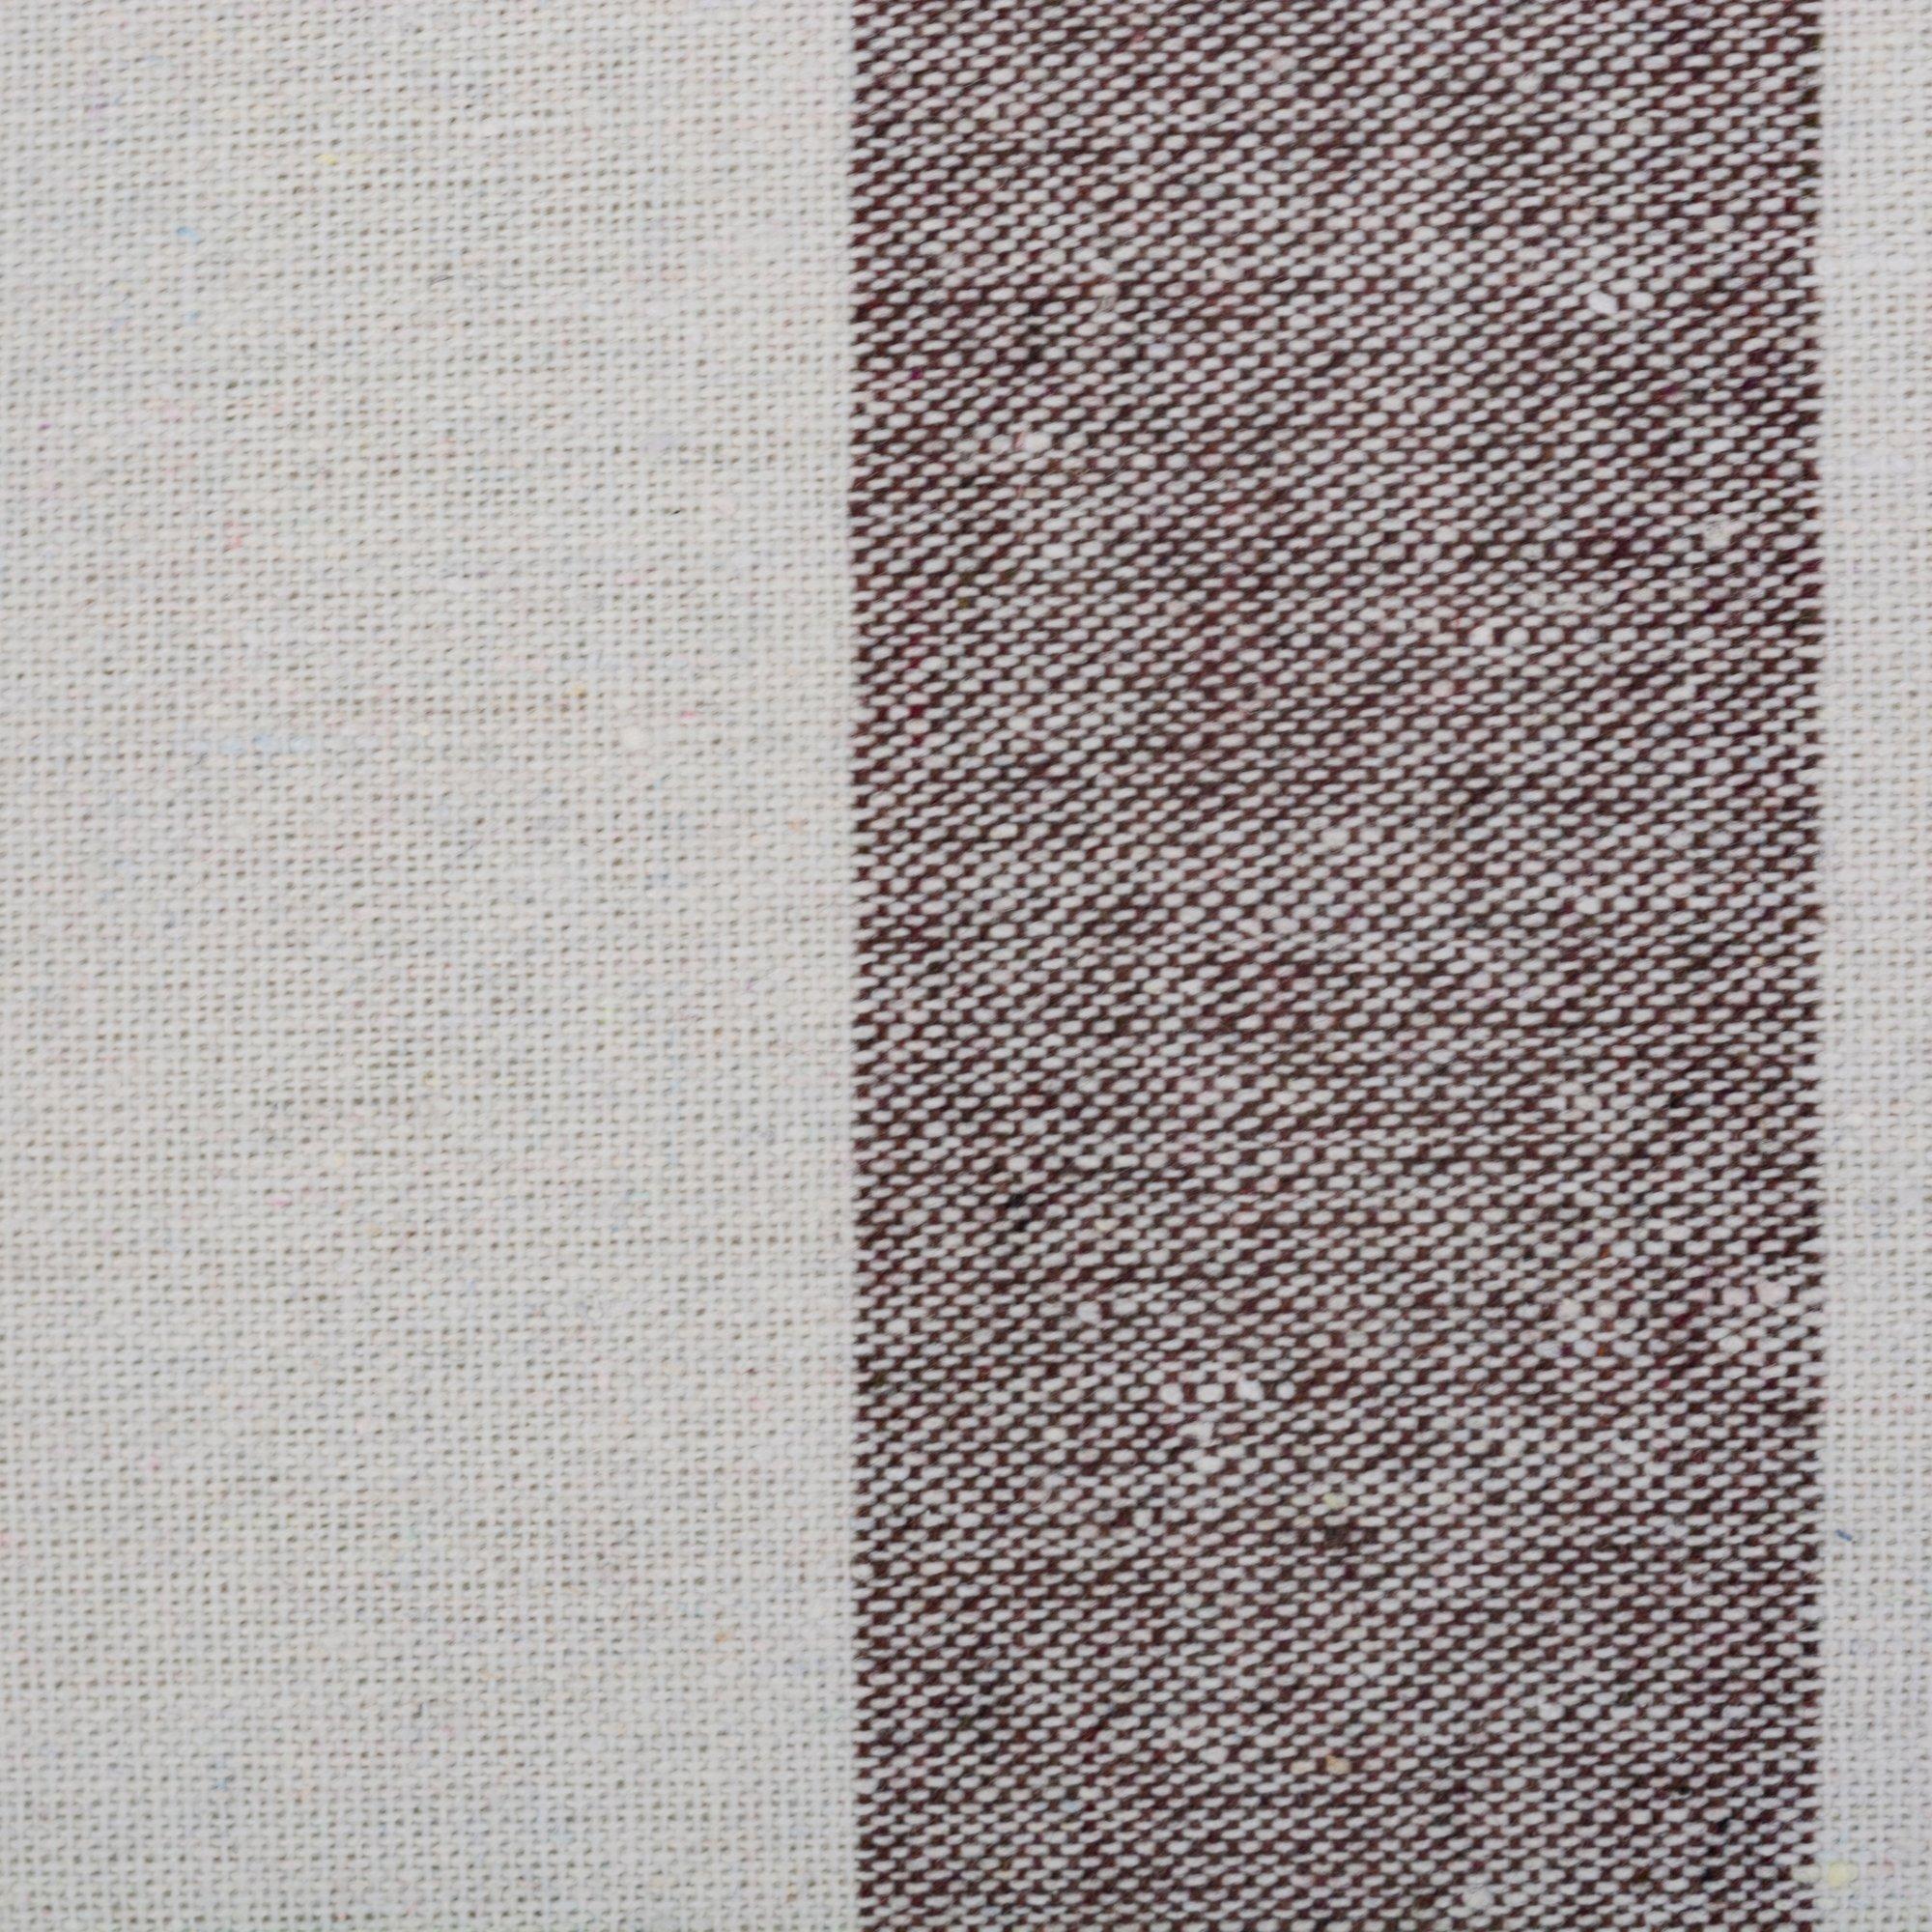 DII Boho Stripe Beach Bag 16x20x7 Shoulder Travel Tote Black, Boho Stripe Brown by DII (Image #2)